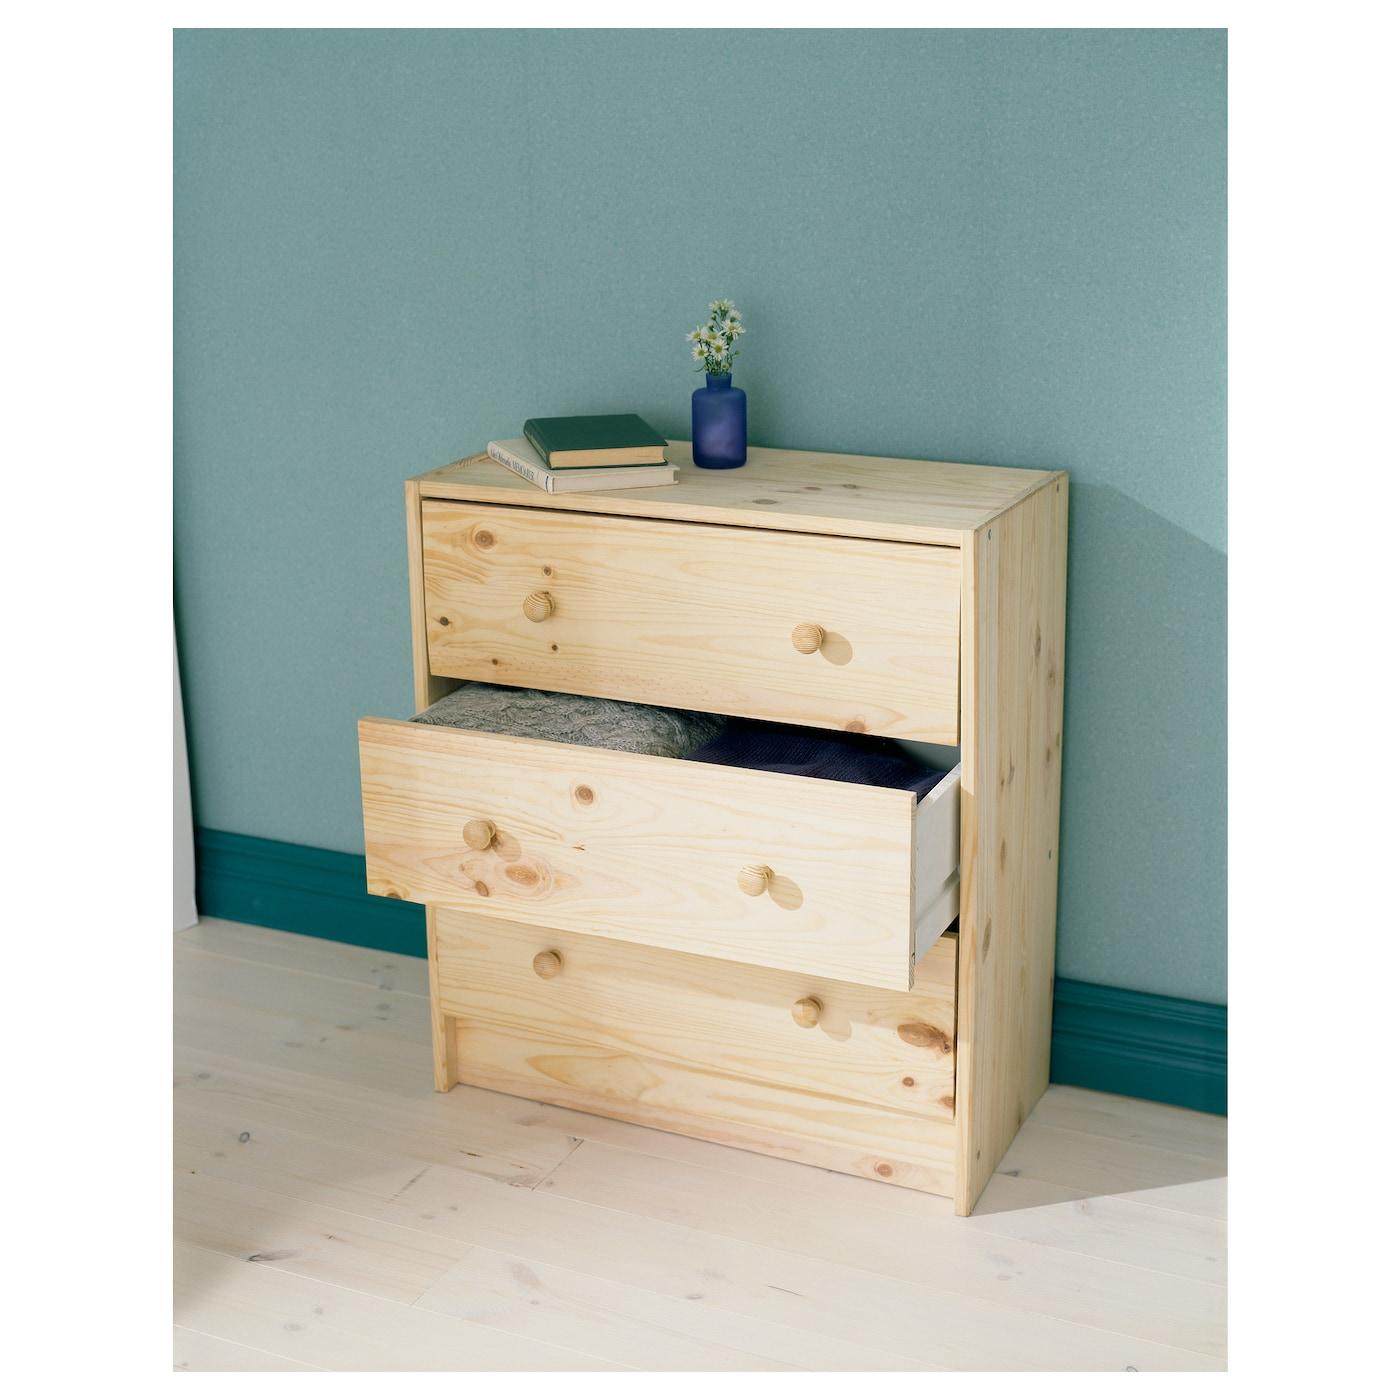 Buy Rast Chest Of 3 Drawers Pine 62x70 Cm Online Uae Ikea